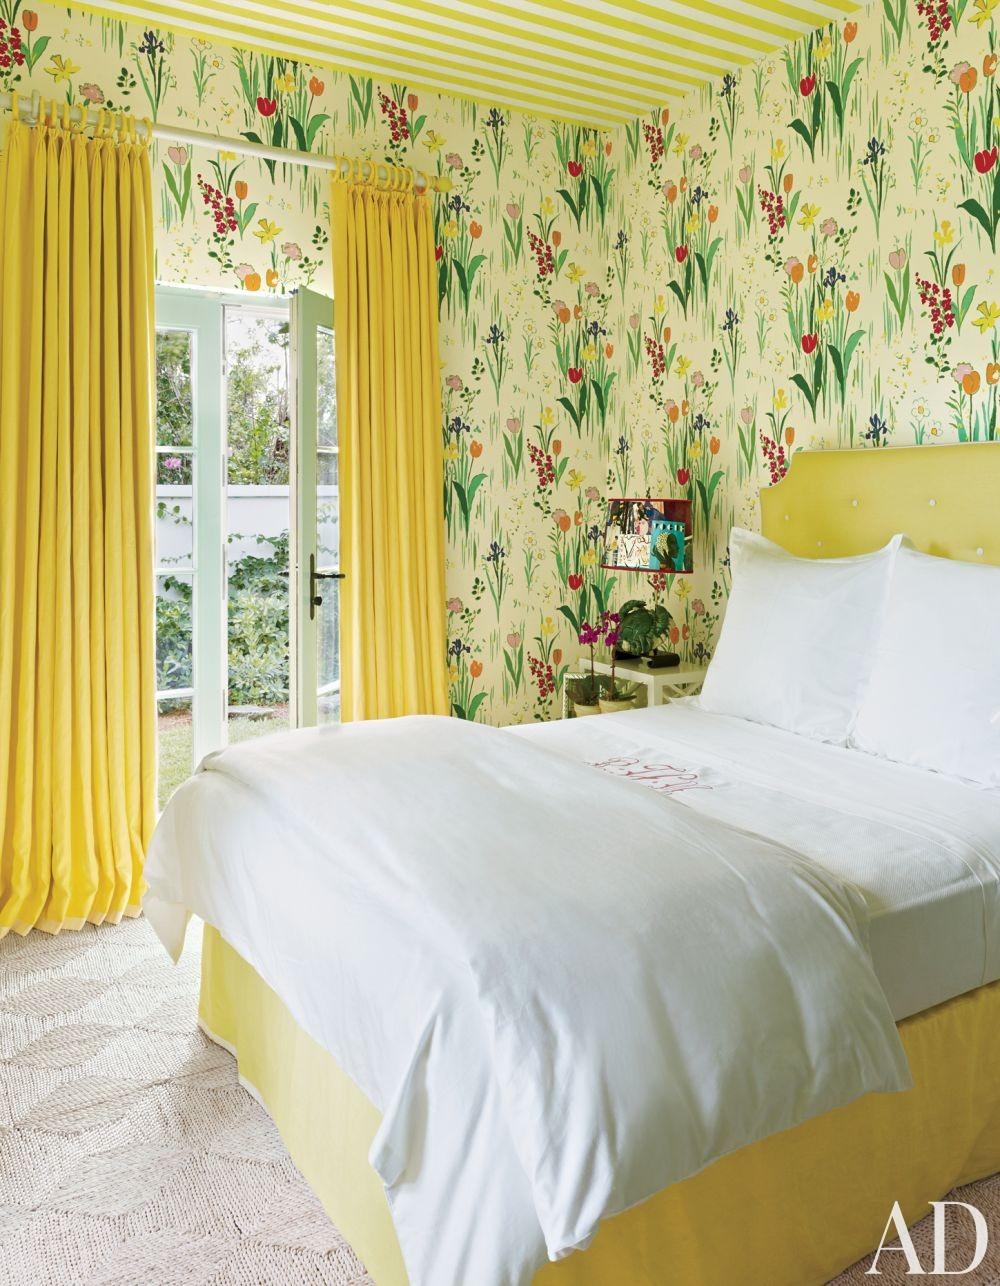 Beach Bedroom by Miles Redd in Lyford Cay, Bahamas